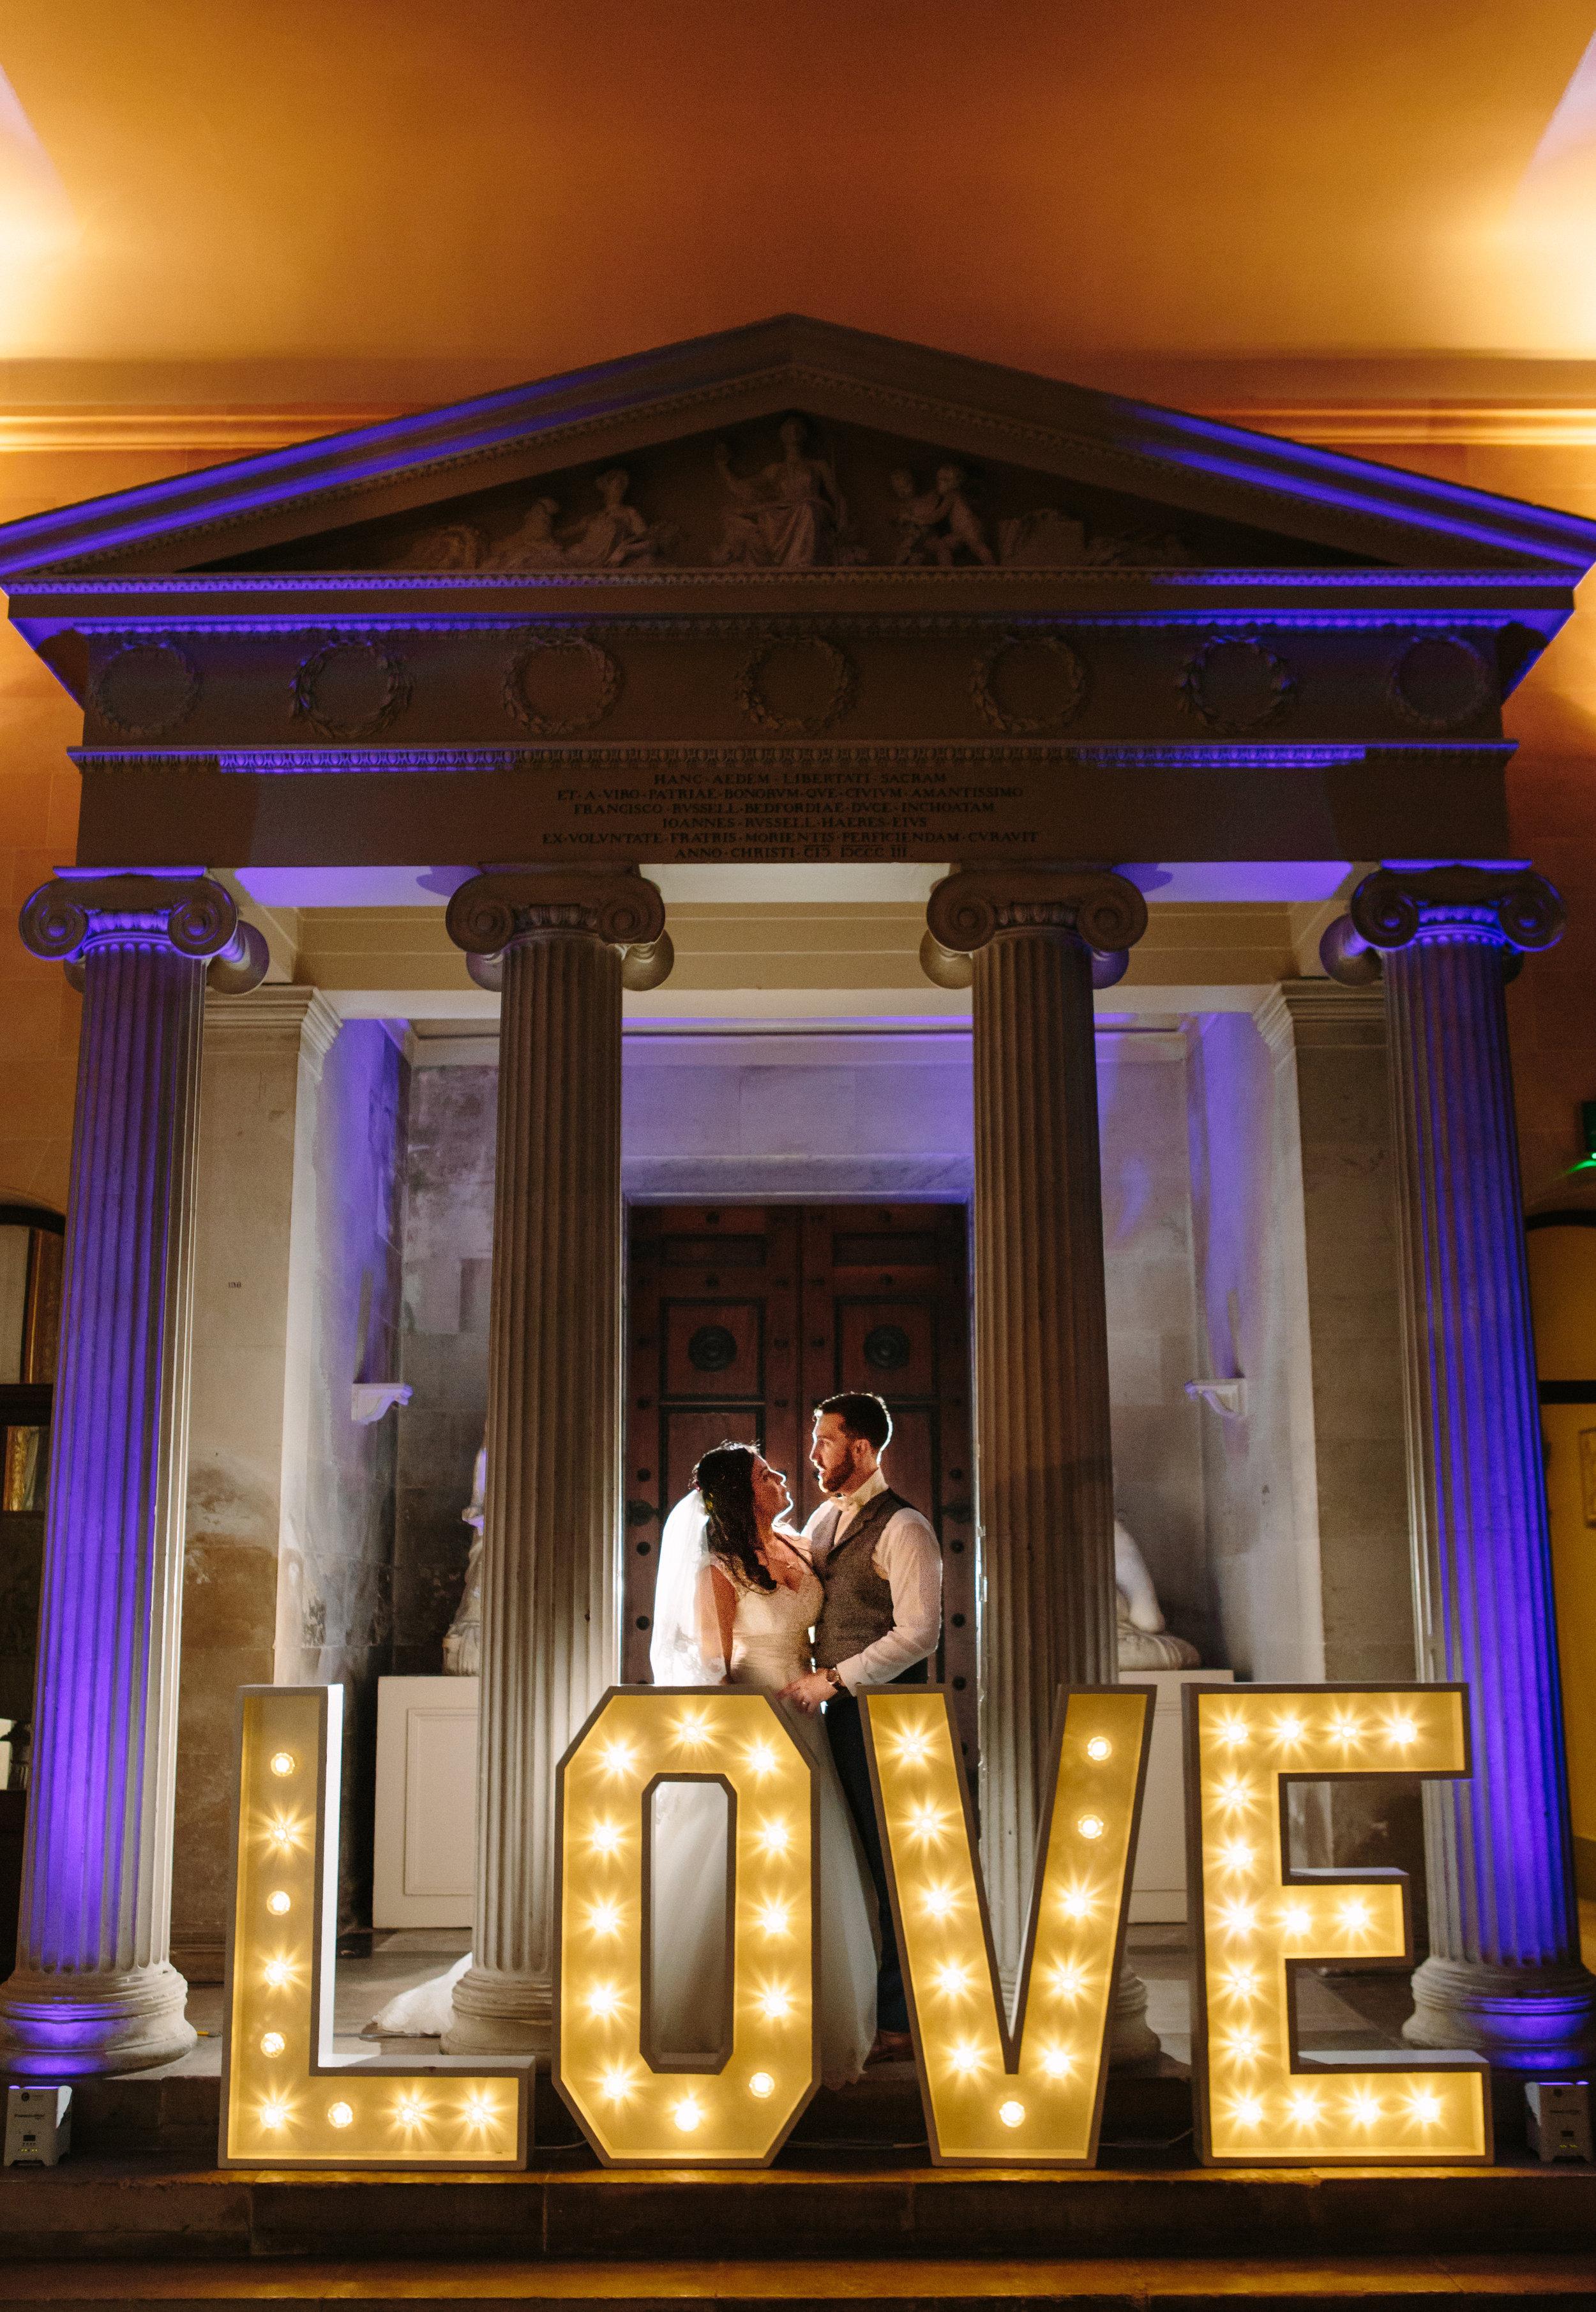 london-bedfordshire-uk-wedding-photography-woburn-scultpture-gallery-love-portrait-01